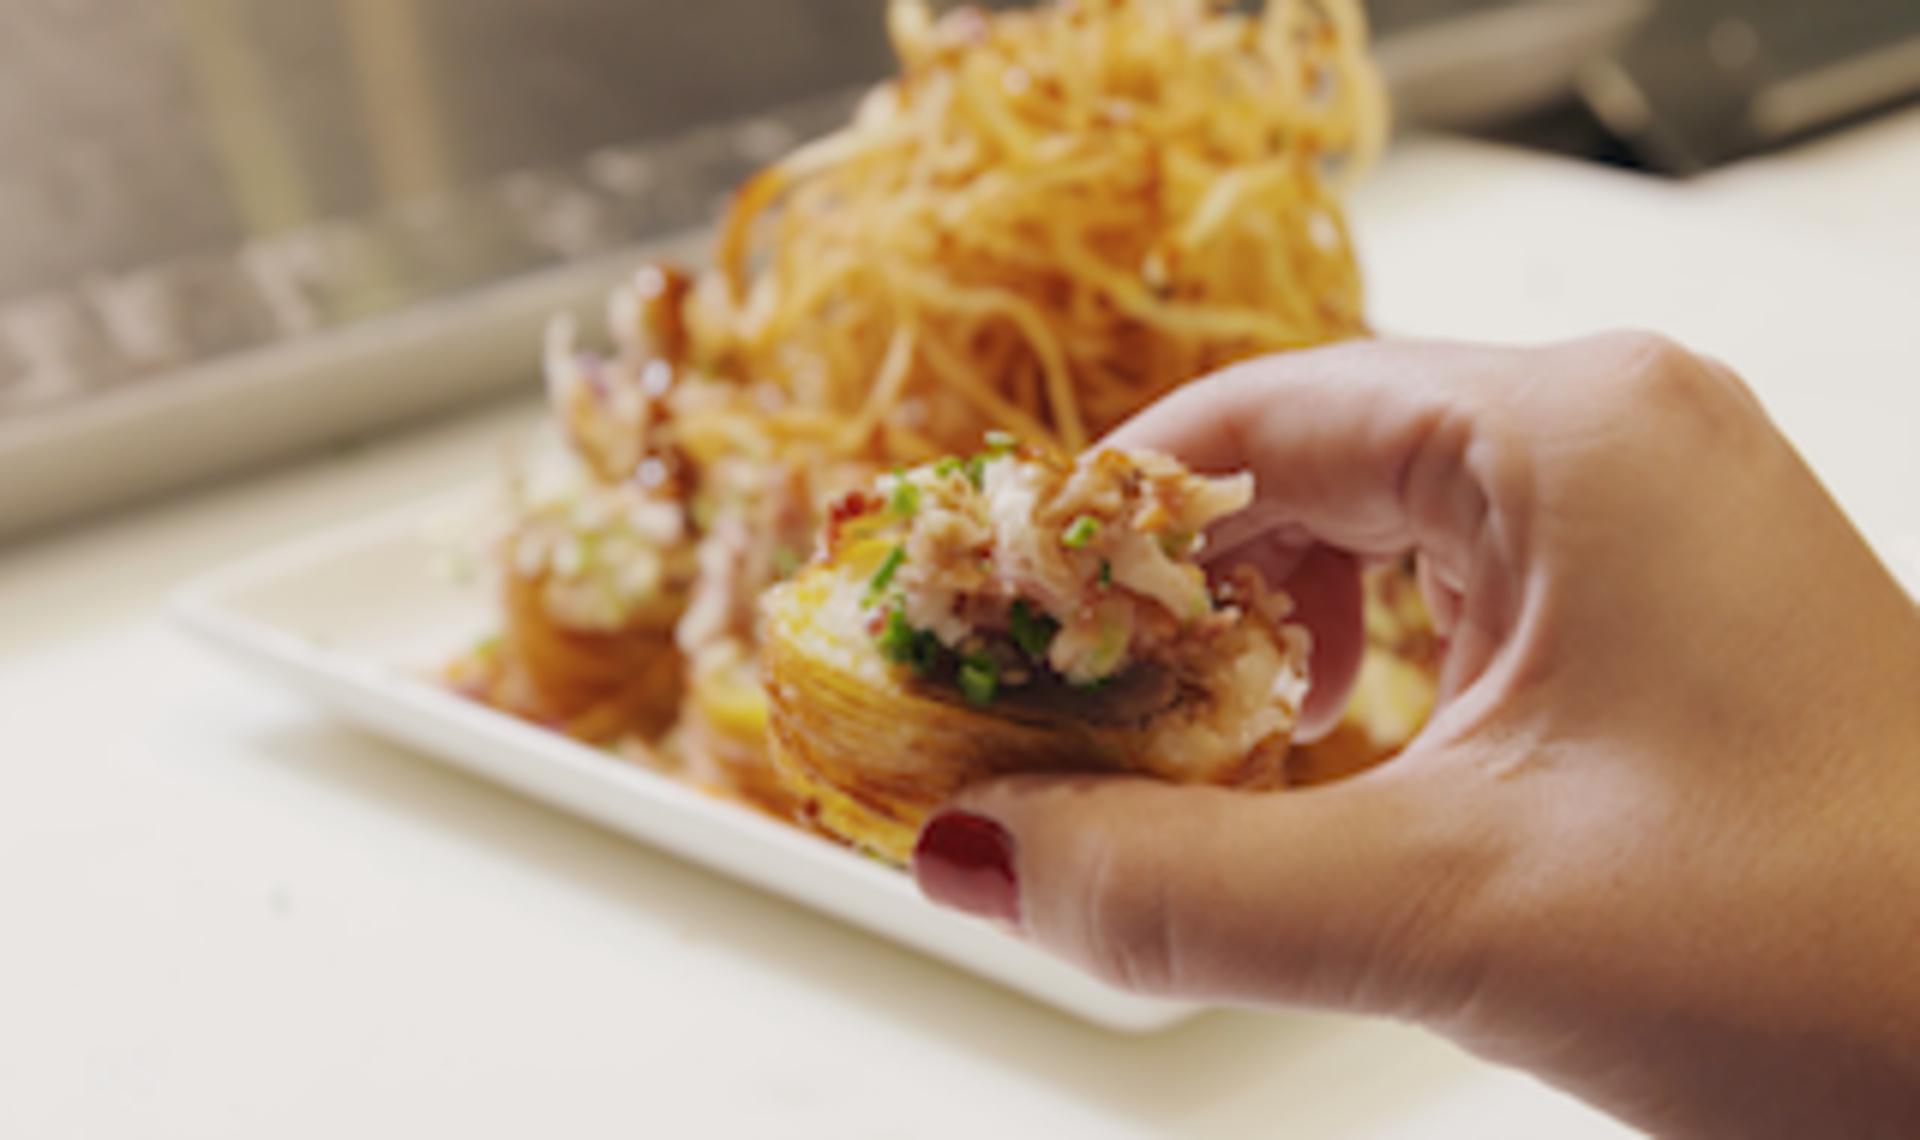 Burgushi: The Burger and Sushi Combo You Need